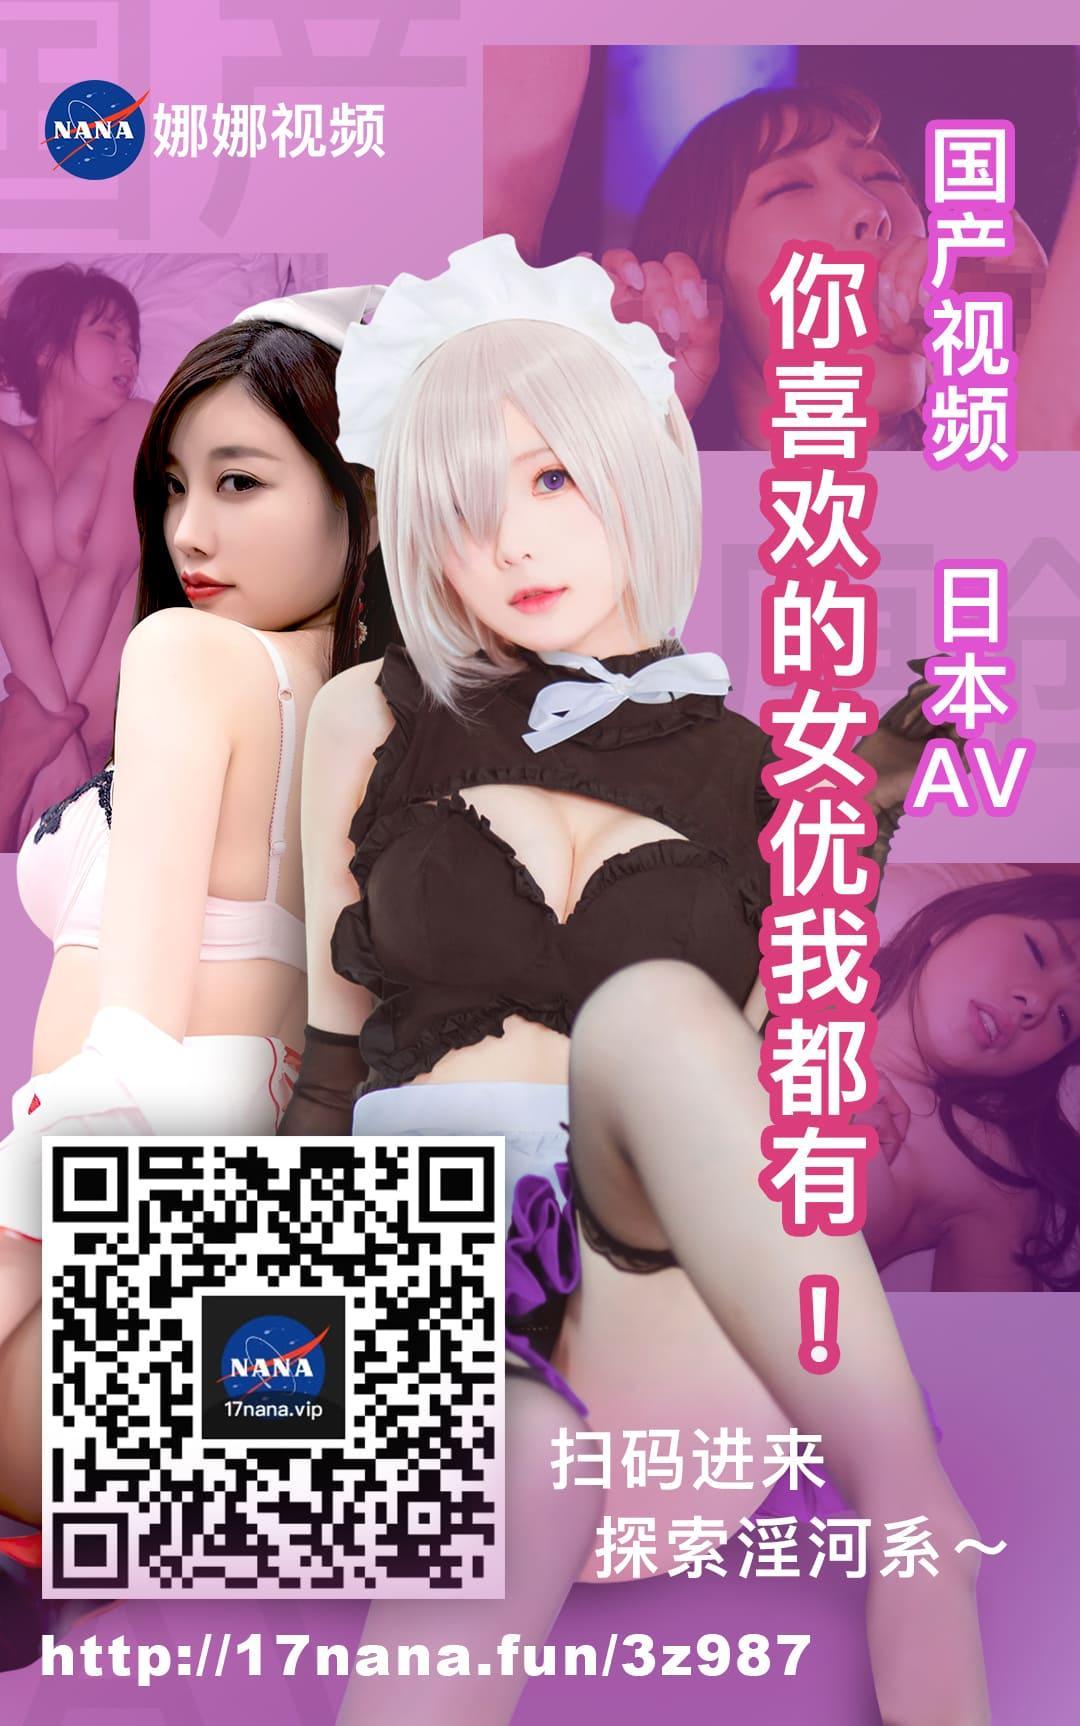 Joukyou Musume no Junan - Drunk temptation 22